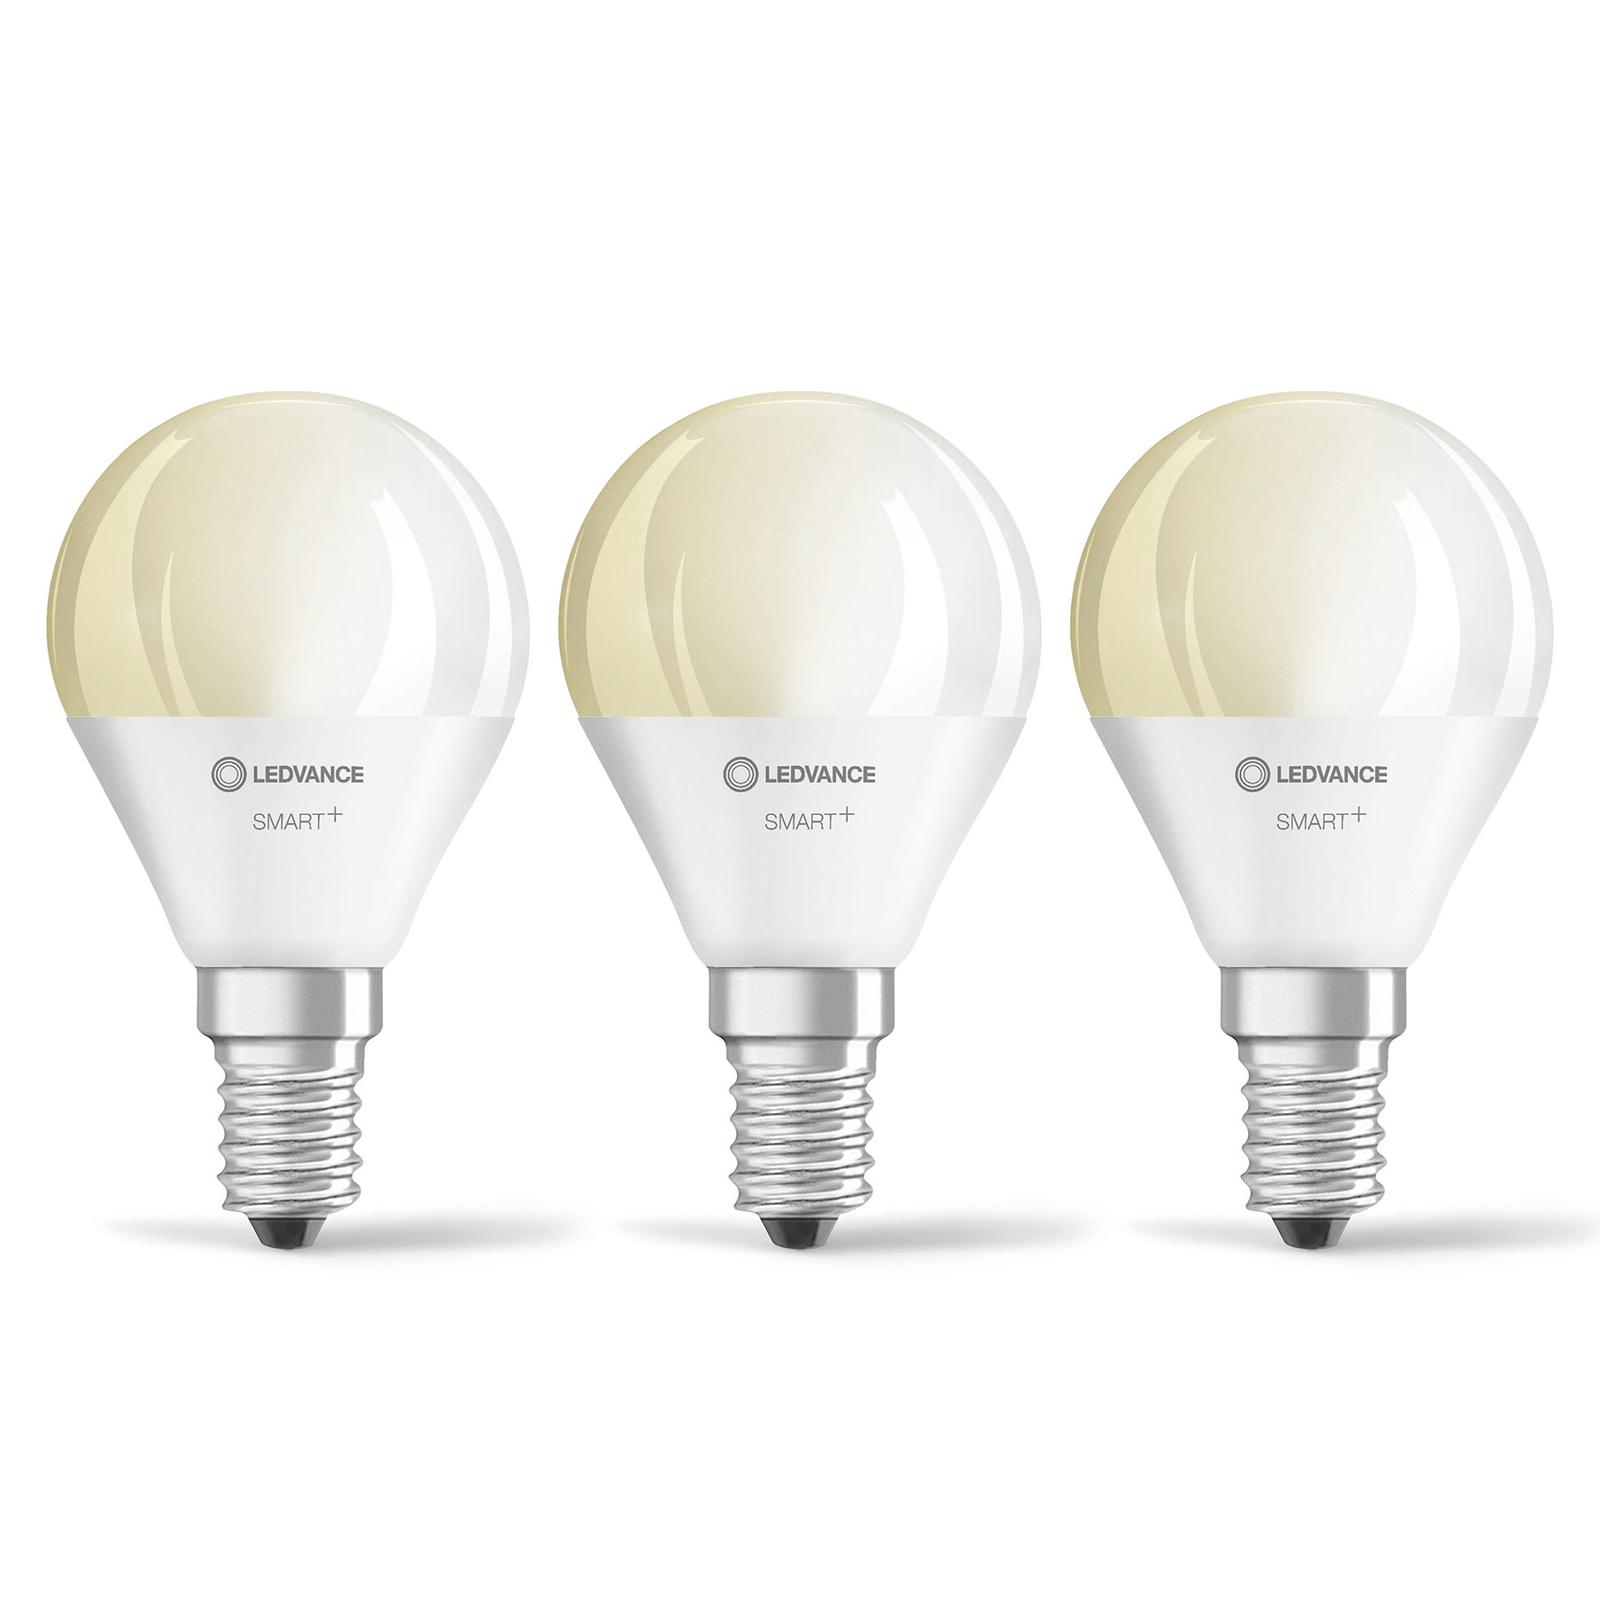 LEDVANCE SMART+ WiFi E14 5W kropla 2700K 3 szt.